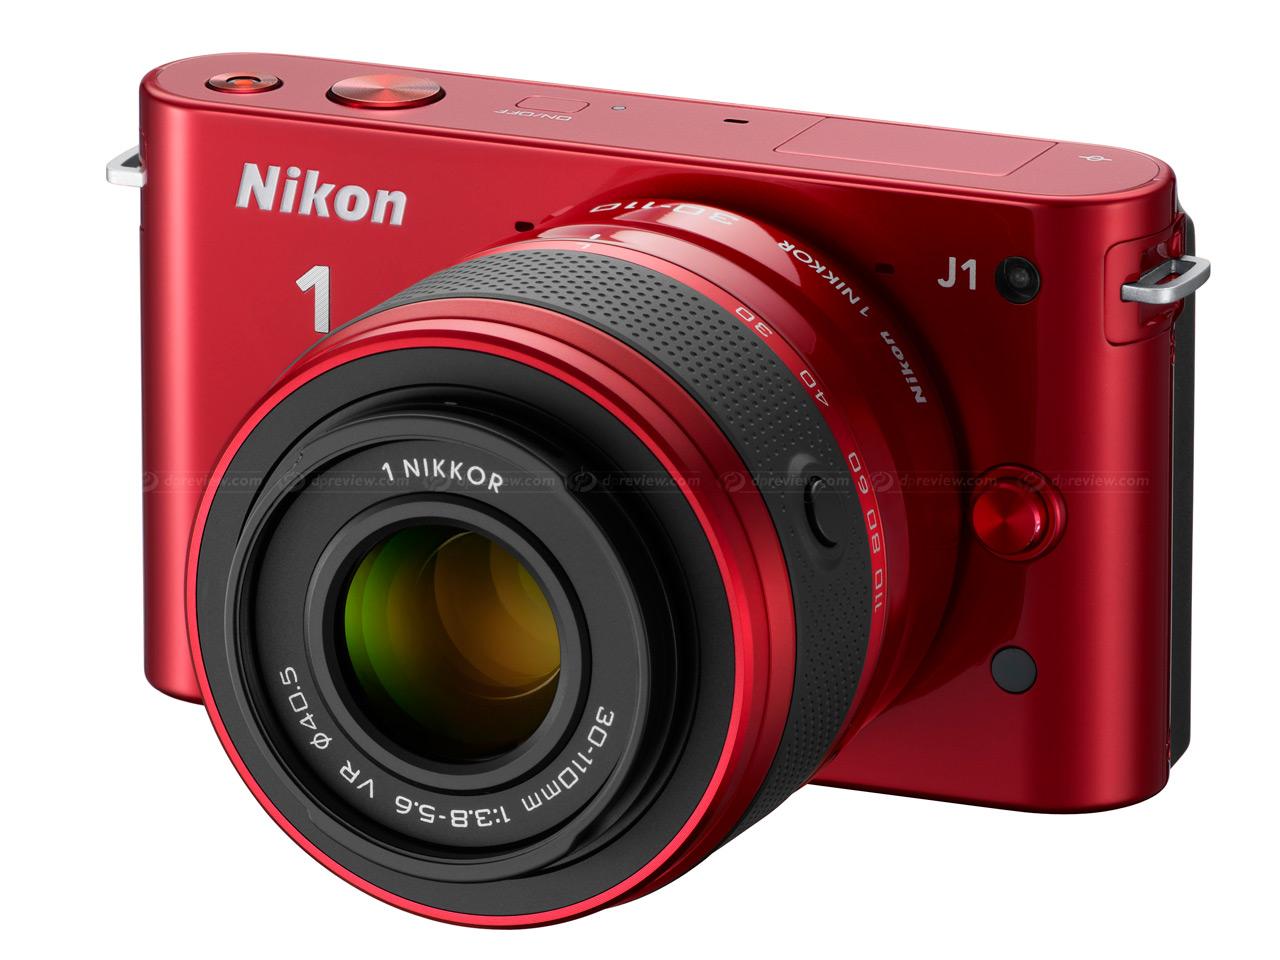 Camera Nikon Smallest Dslr Camera nikon unveils j1 small sensor mirrorless camera as part of 1 the j1